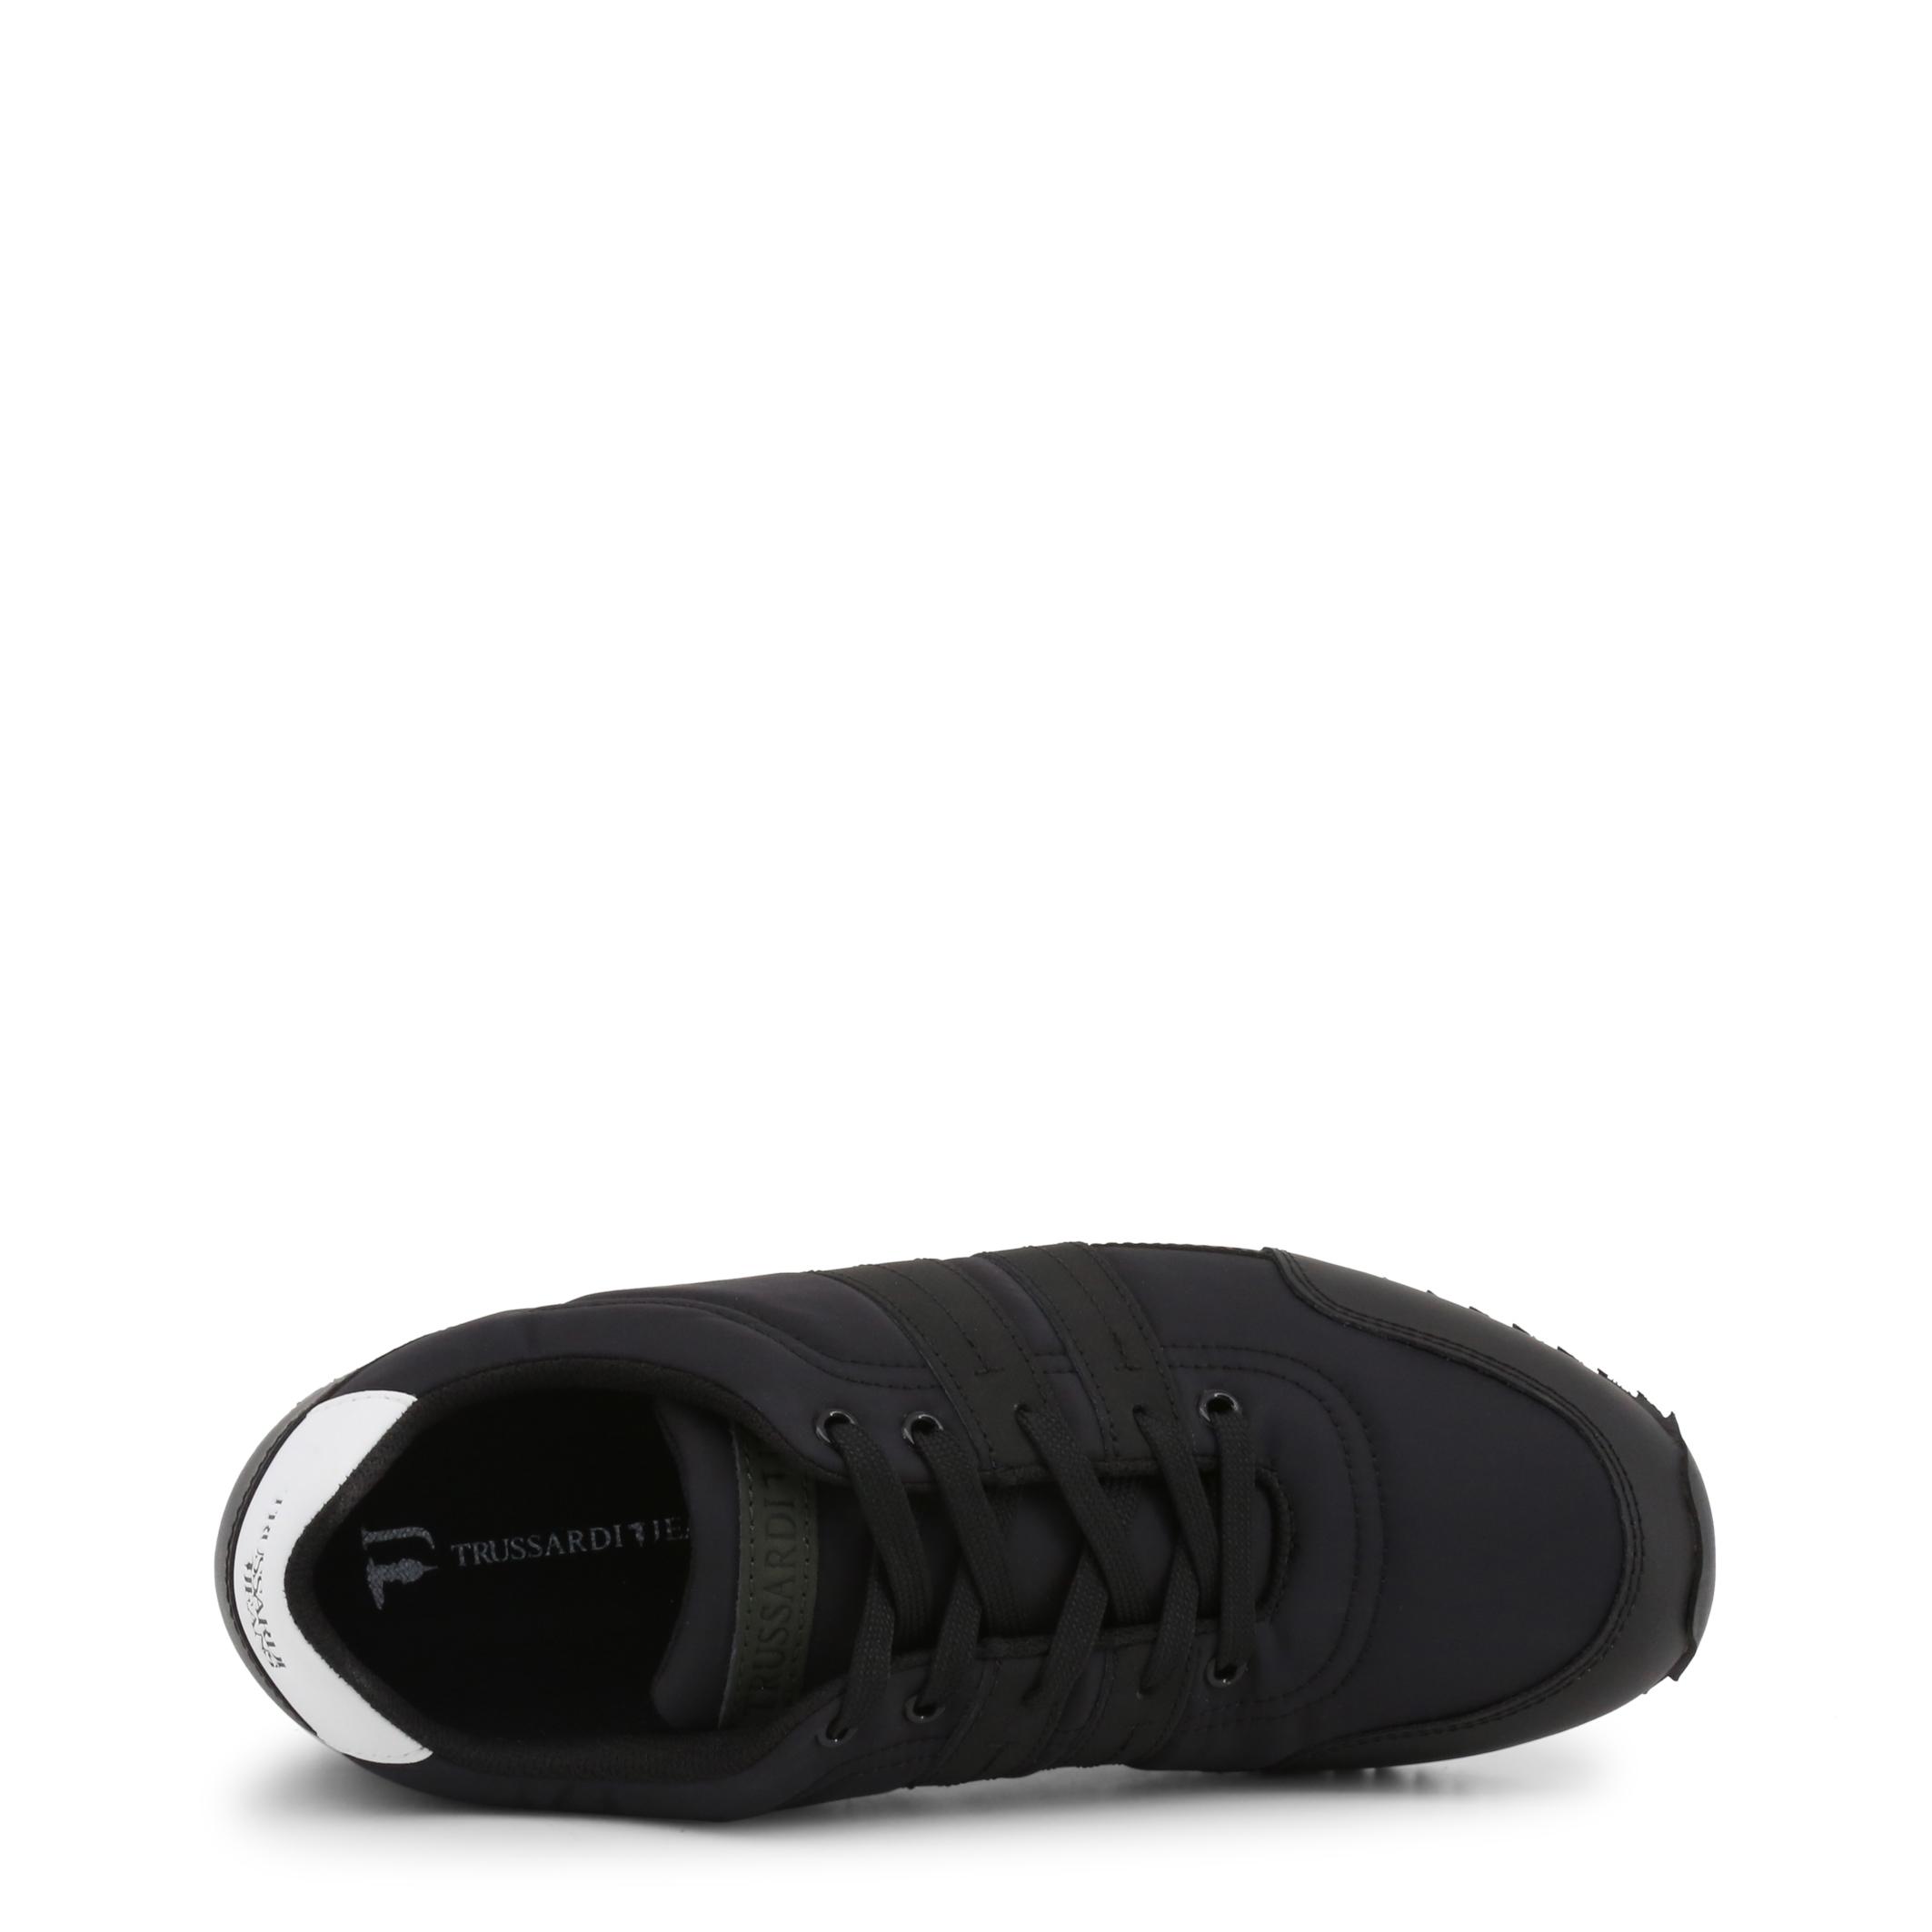 Sneakers-Trussardi-77A00105-Uomo-Nero-102754 miniatura 3